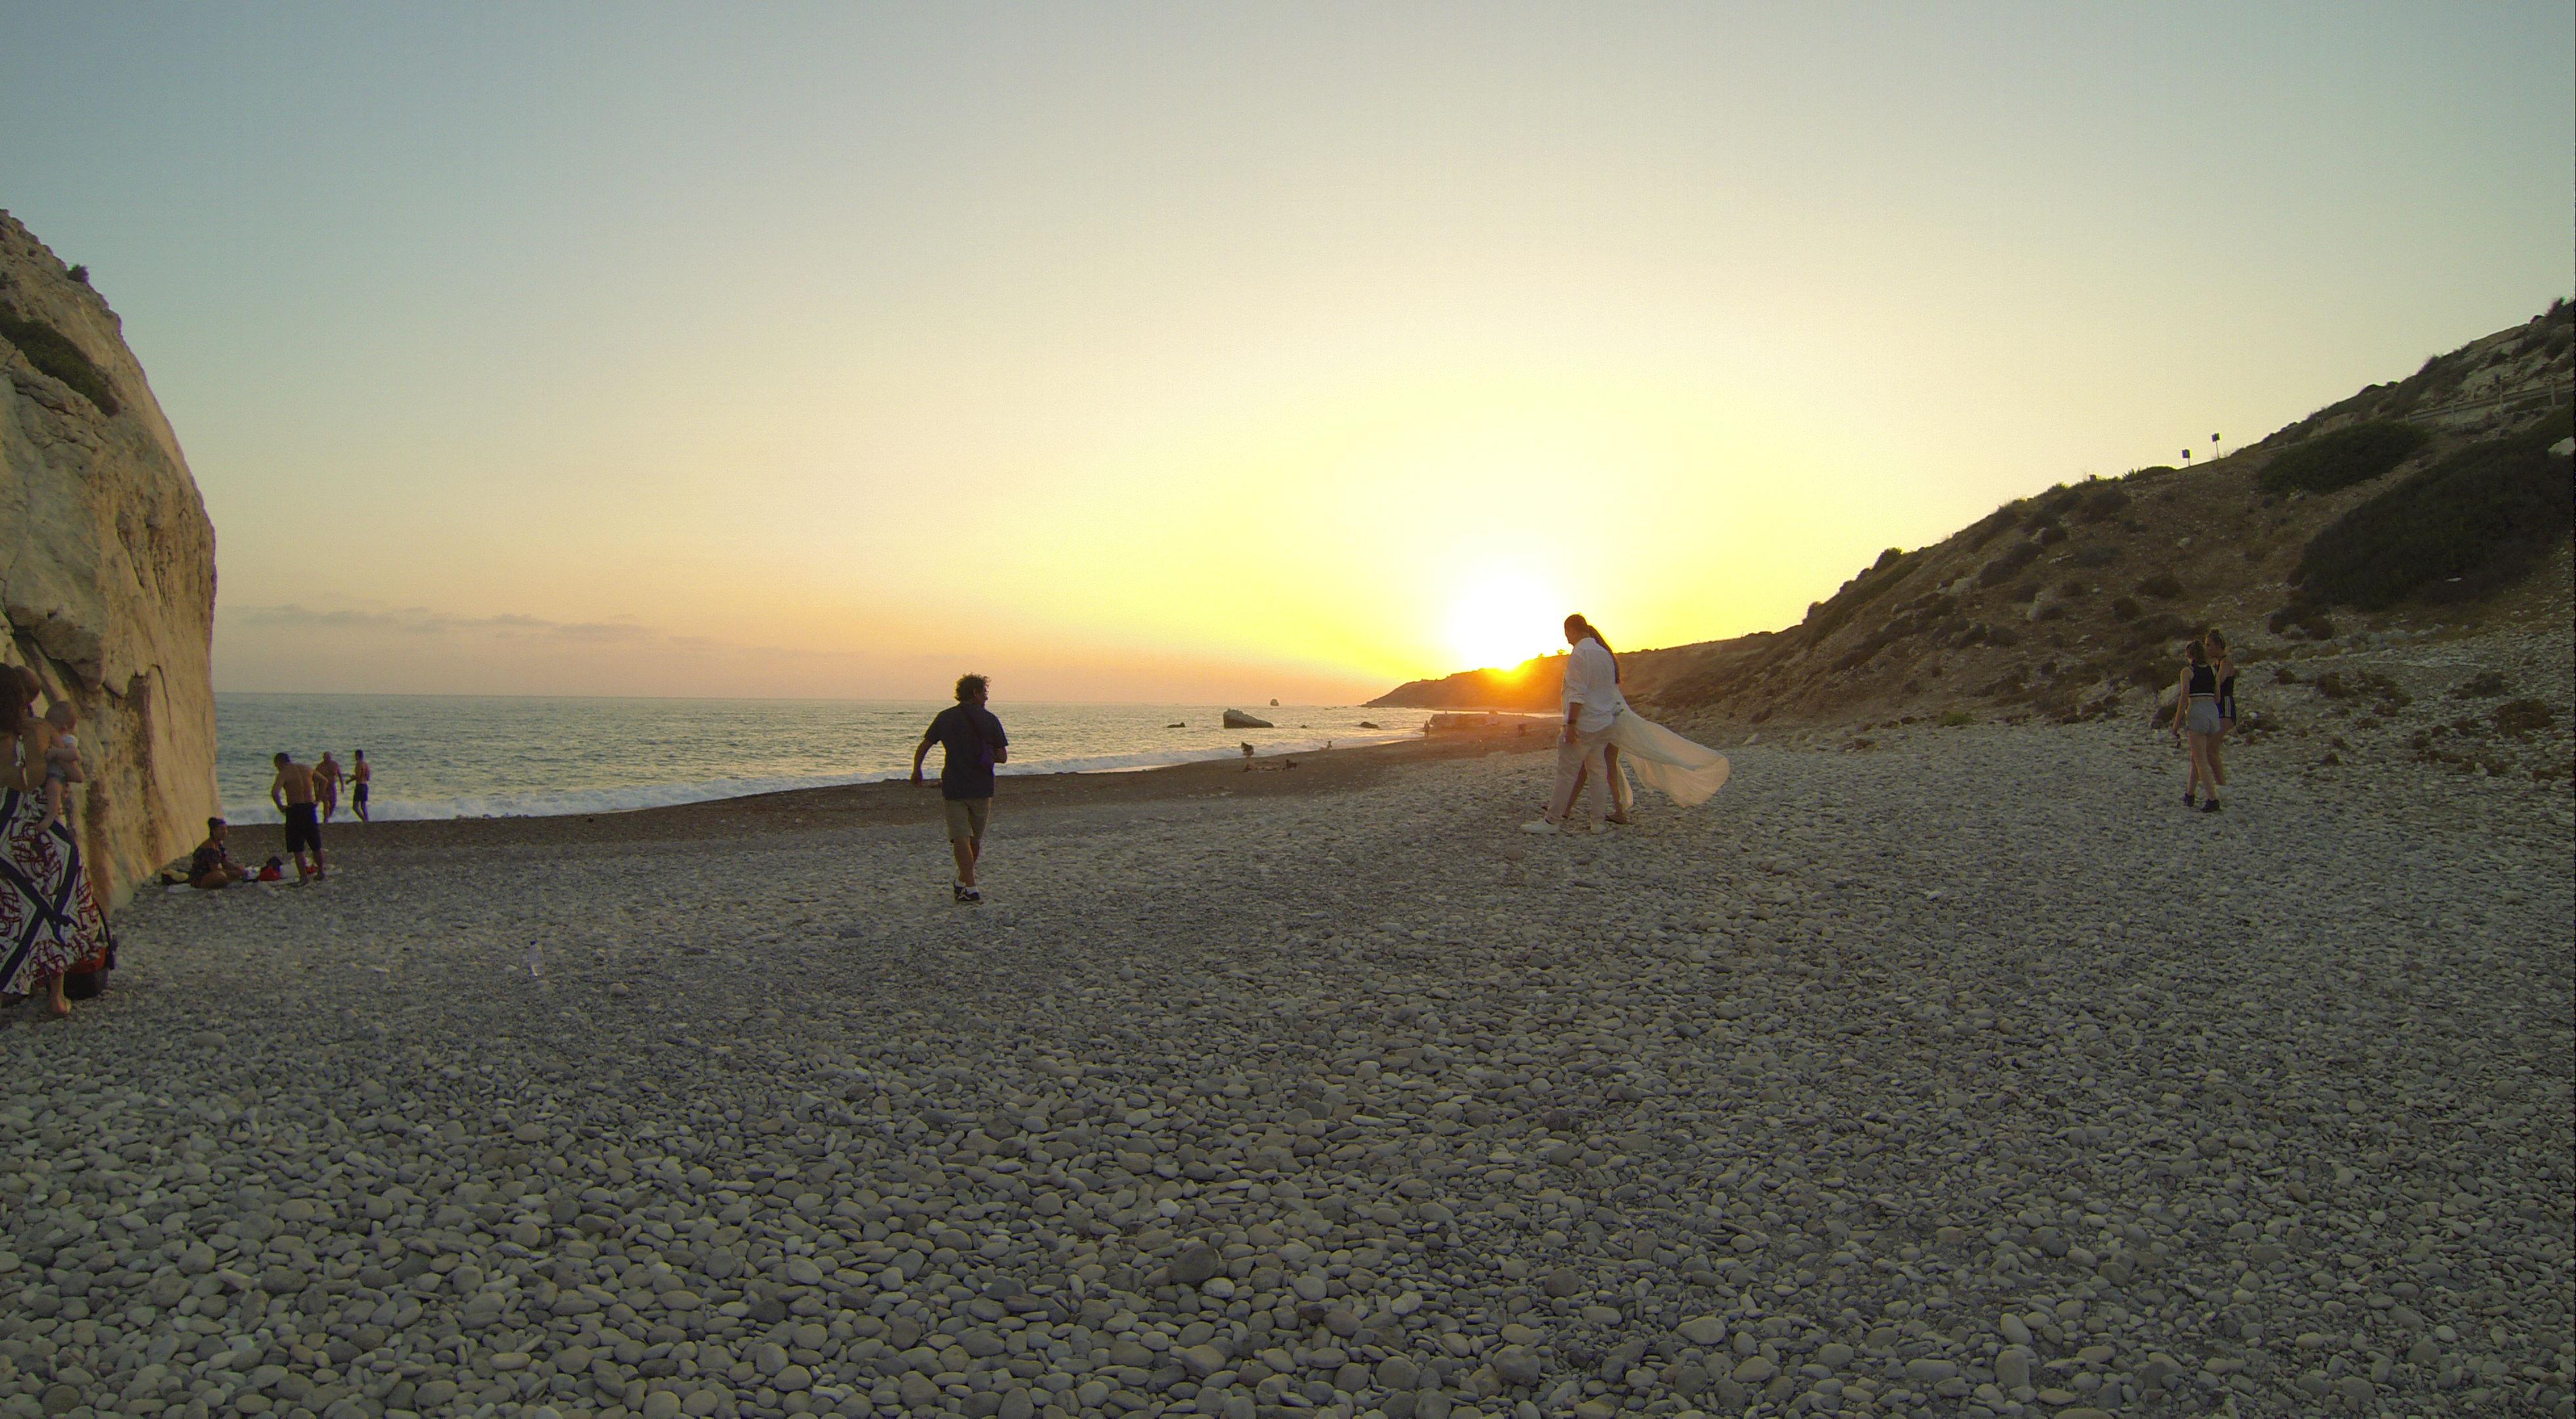 At Aphrodite's Rock beach area